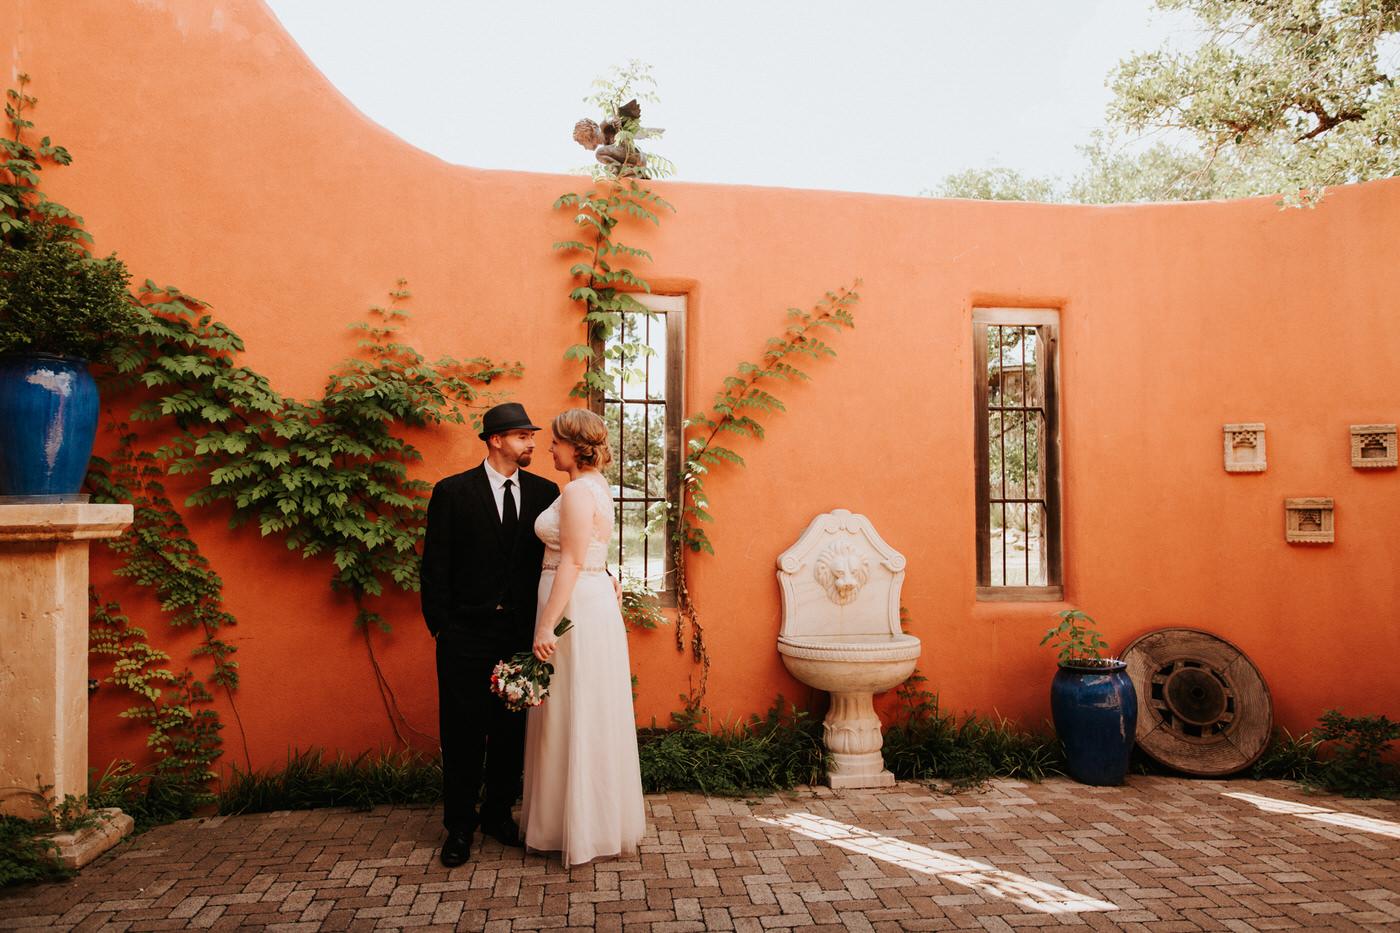 Chapel Dulcinea Elopement Wedding - Diana Ascarrunz Photography-329.jpg